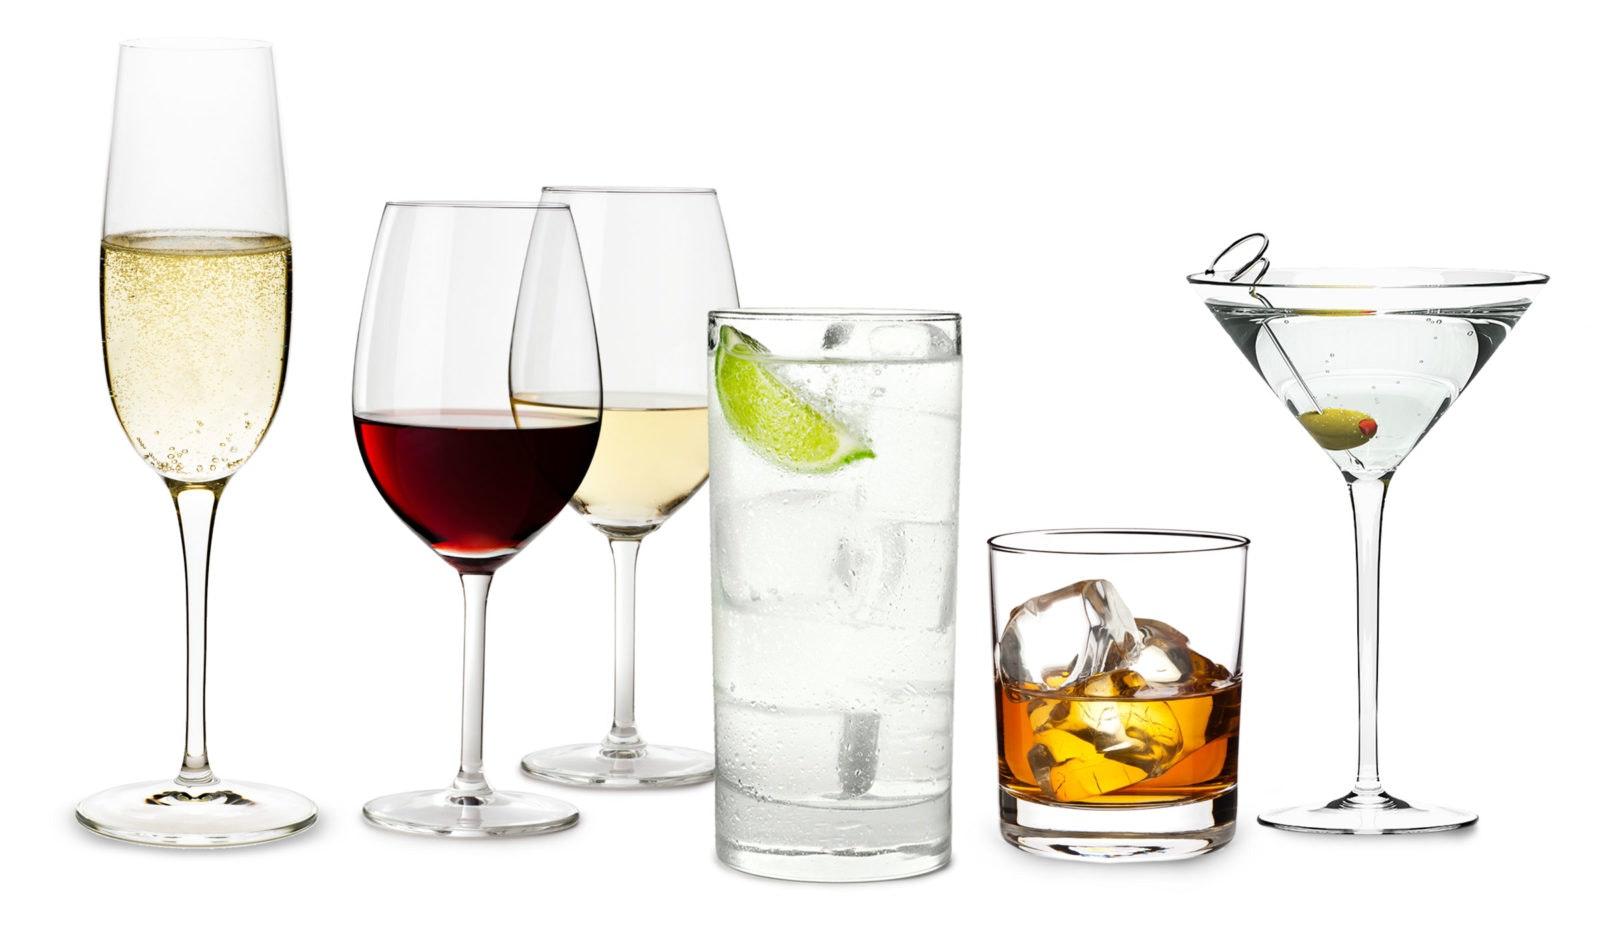 How to drink liquor